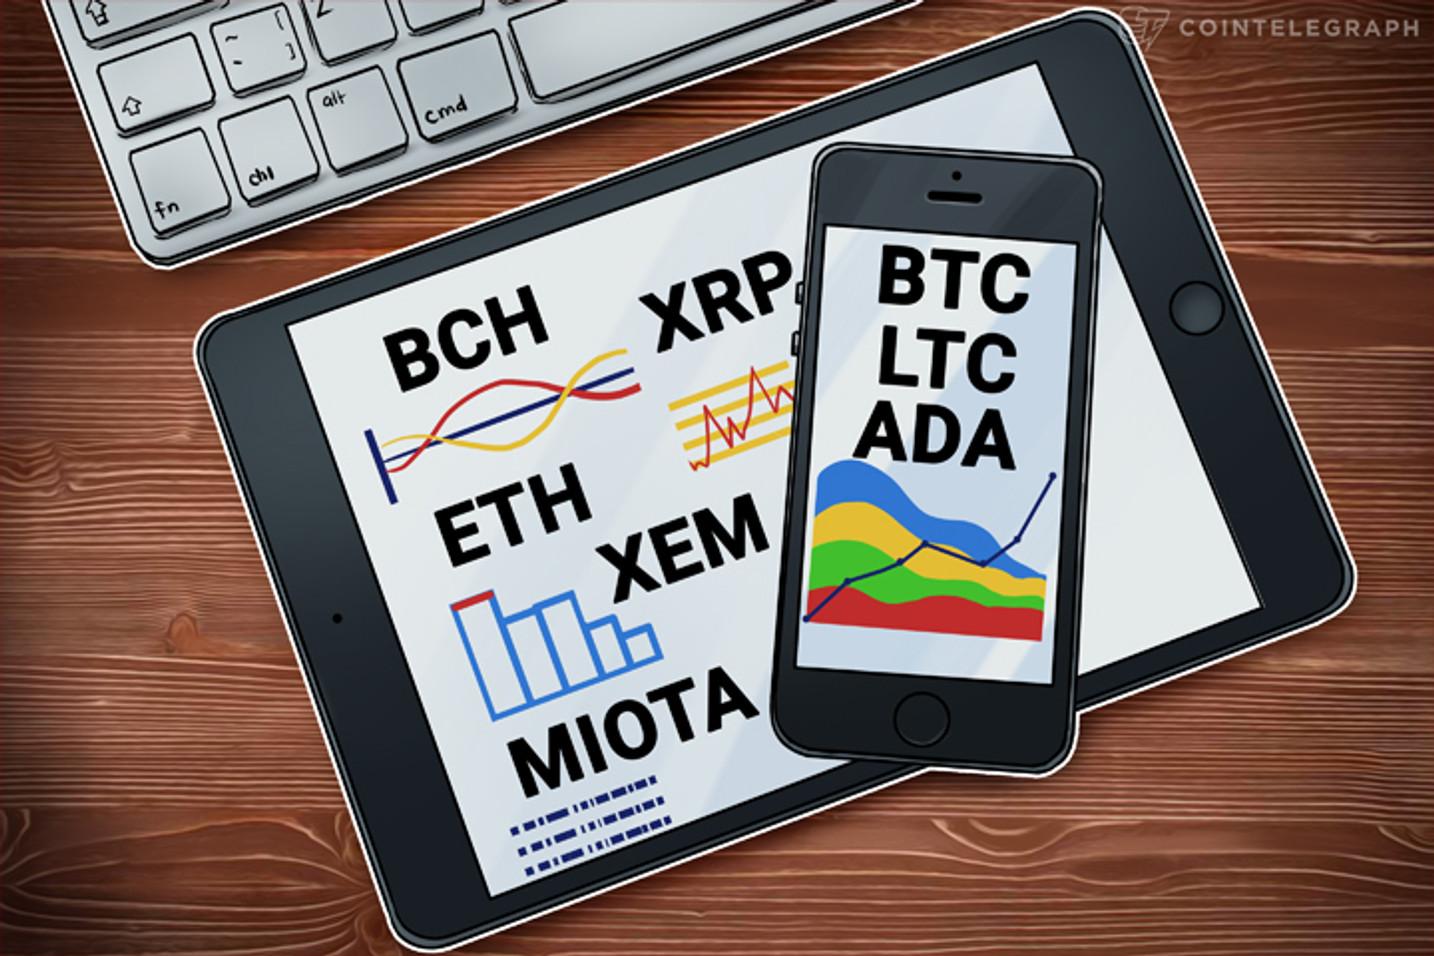 Análise de preços, 4 de janeiro: Bitcoin, Ethereum, Bitcoin Cash, Ripple, IOTA, Litecoin, NEM e Cardano